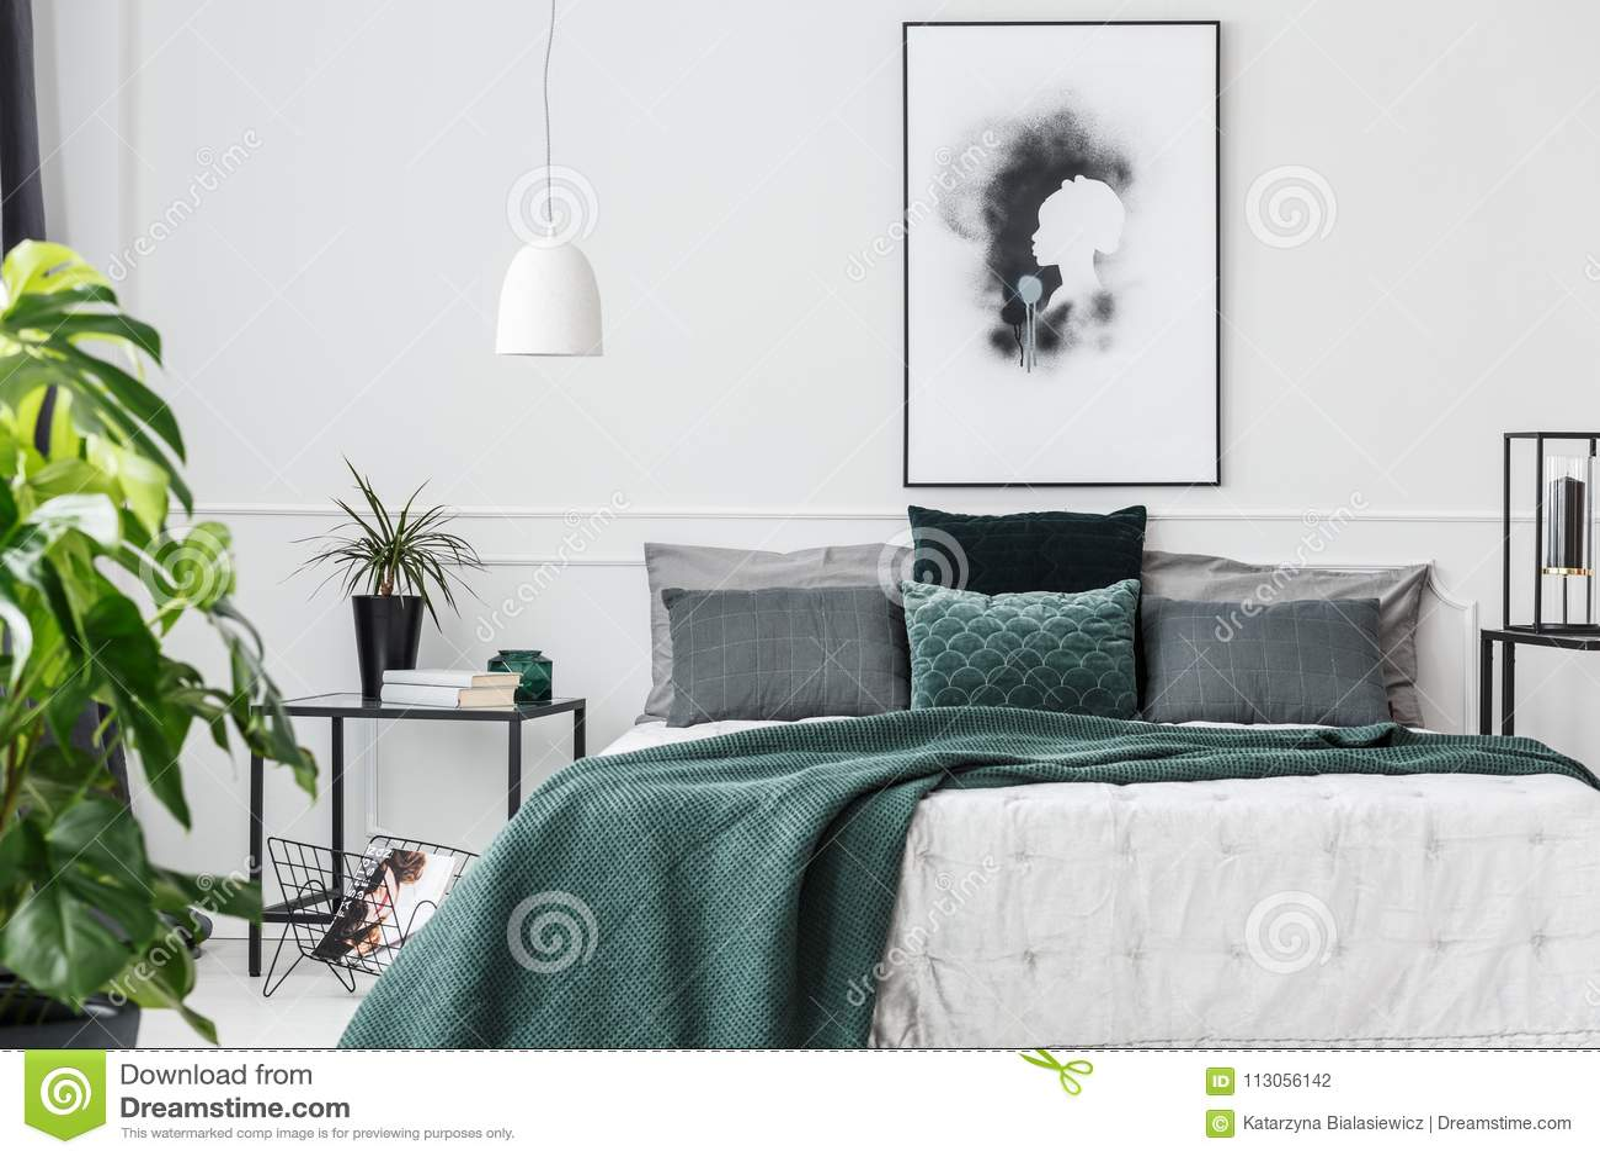 Emerald Green Elegant Bedroom Interior Stock Photo - Image of ...